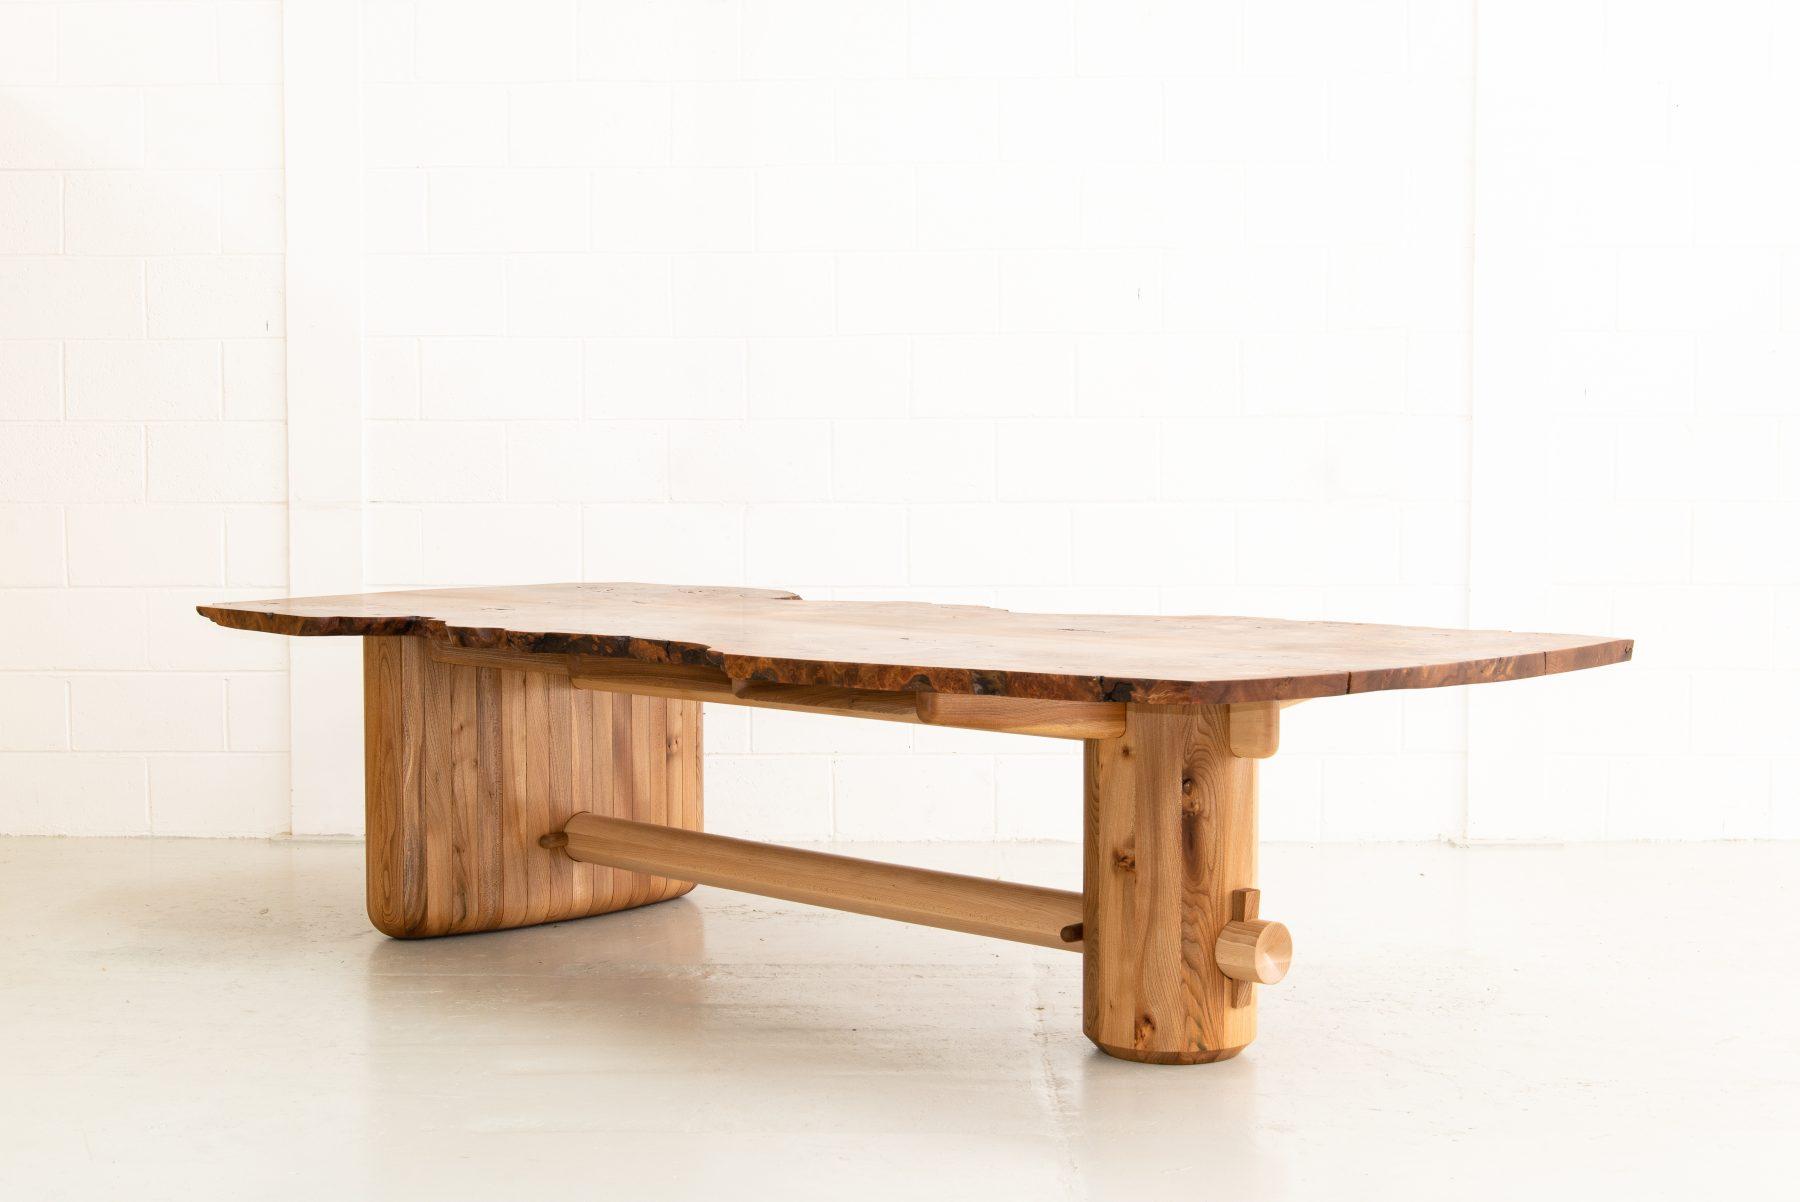 Jan Hendzel Studio Naama Table14